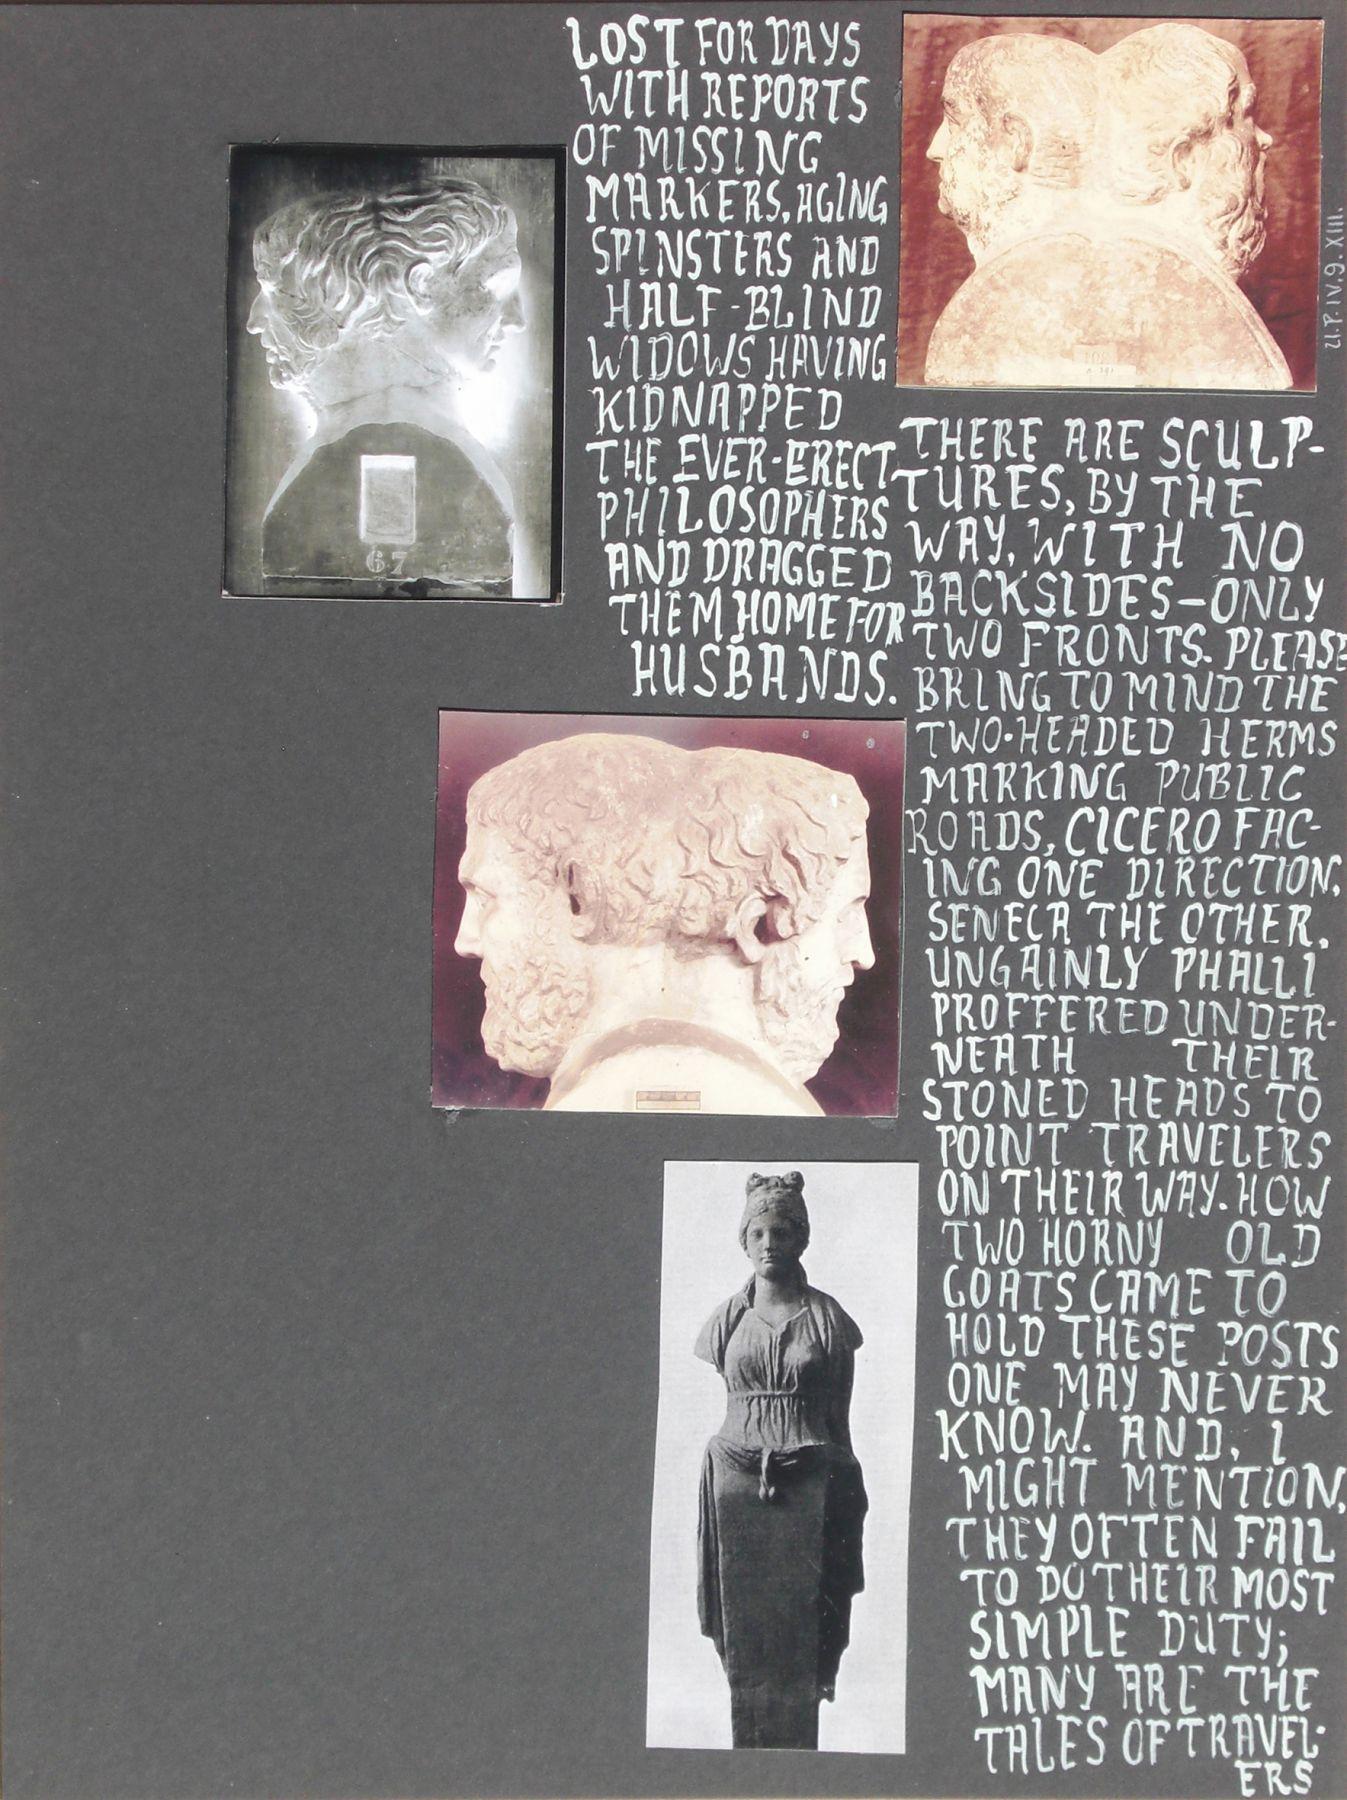 Richard Hawkins Urbis Paganus IV.9.XIII. (Herms I), 2009 Mixed media on mat board 20 x 15 inches (50.8 x 38.1 cm)